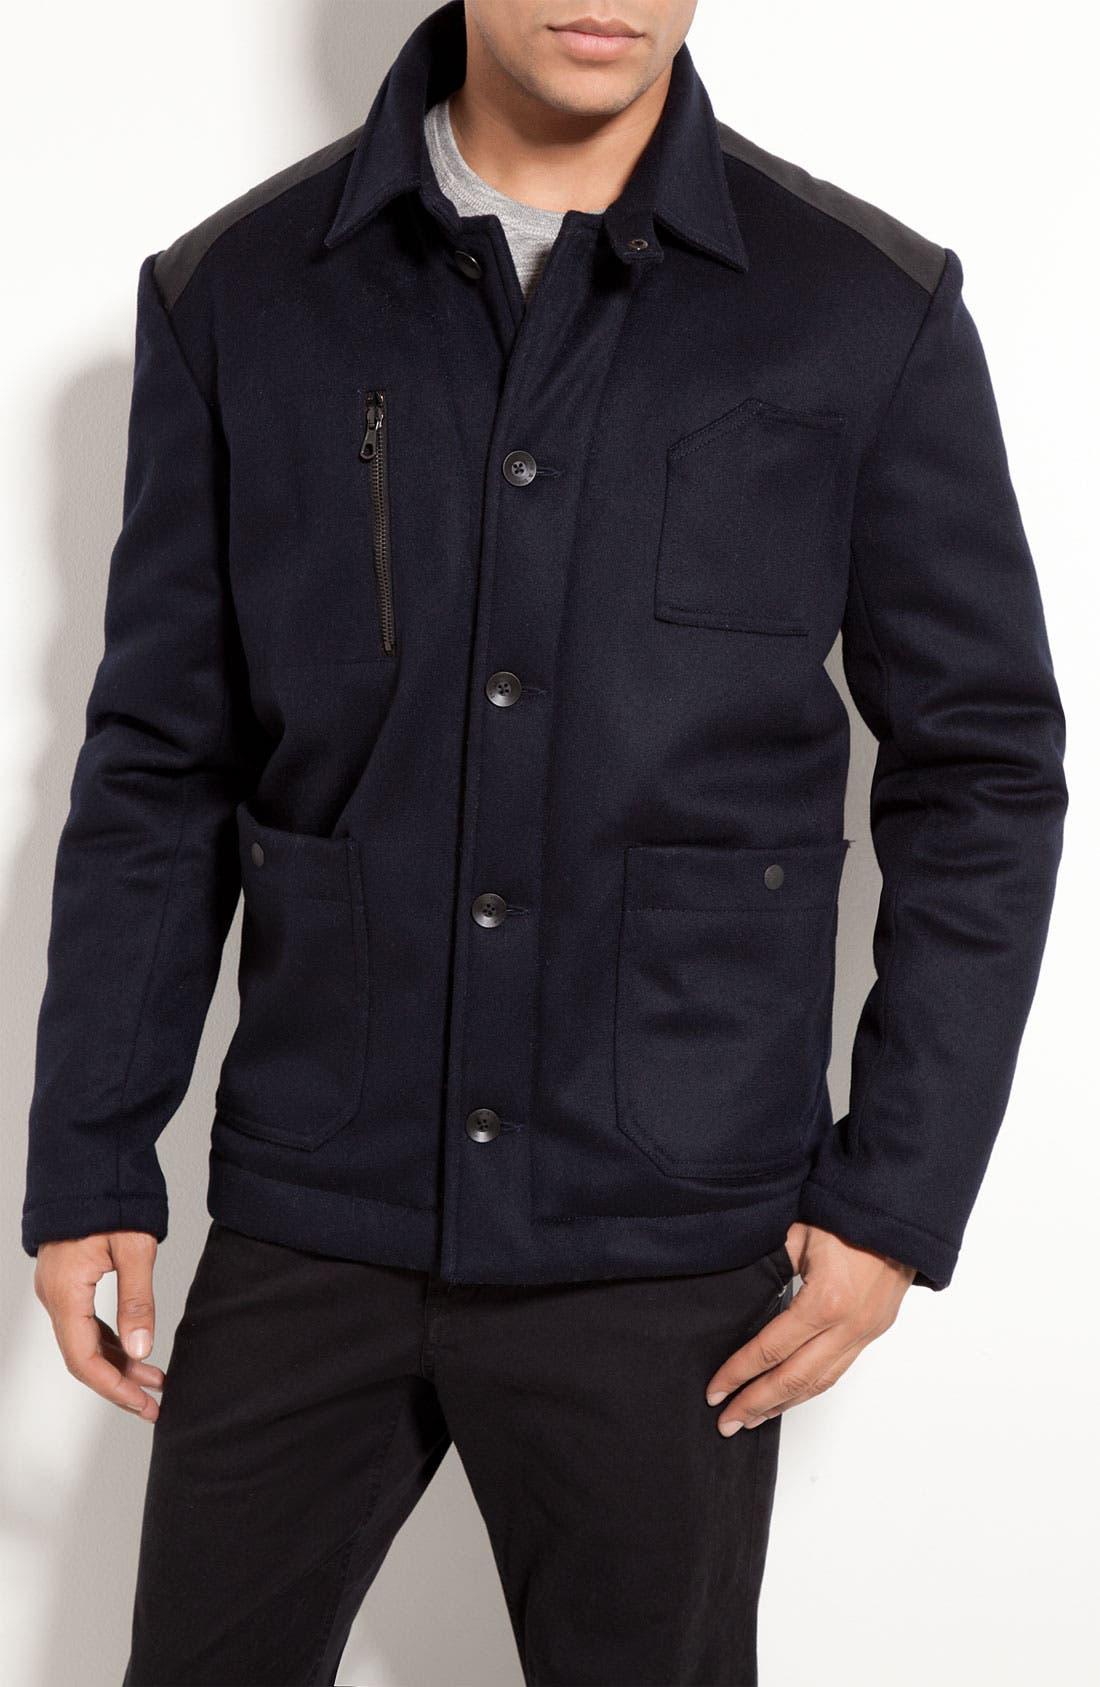 Alternate Image 1 Selected - rag & bone 'Dover' Jacket